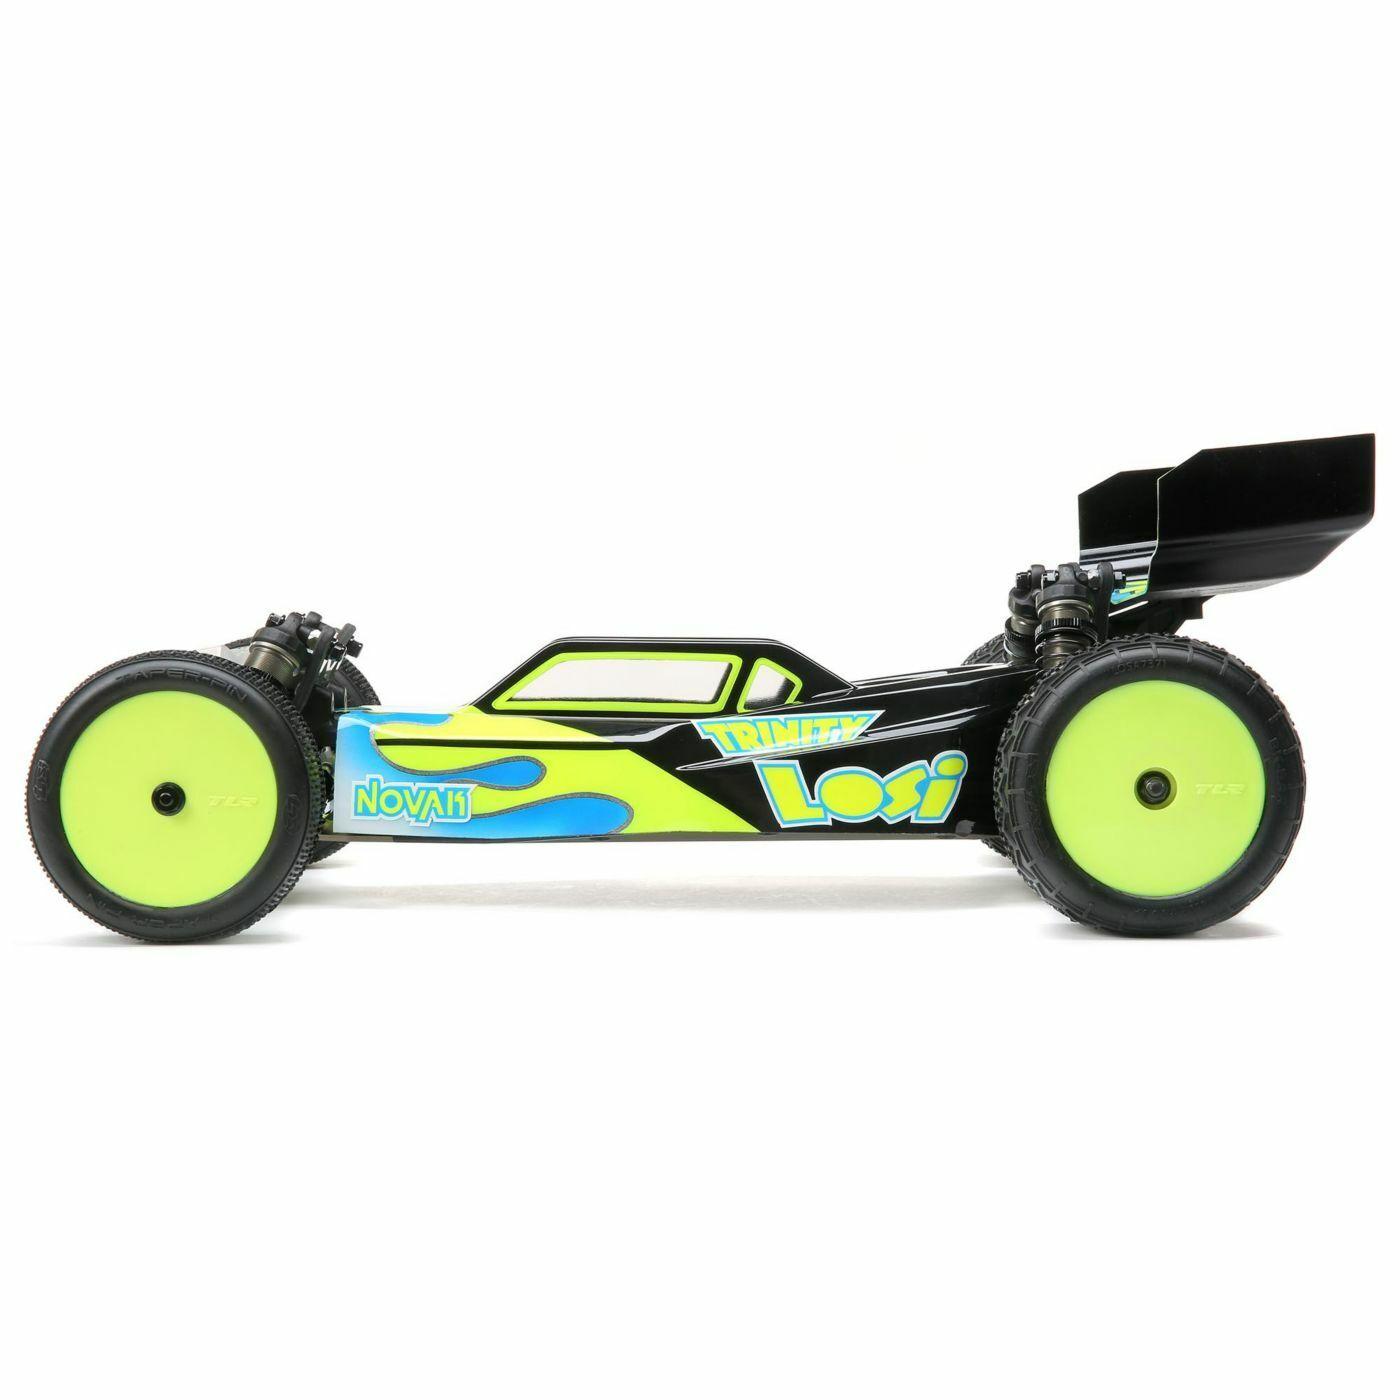 Squadra Losi Racing 1  10 22 5.0 2 rueda Drive DC ELITE Race Kit Dirt Clay TLR03022  Sconto del 40%